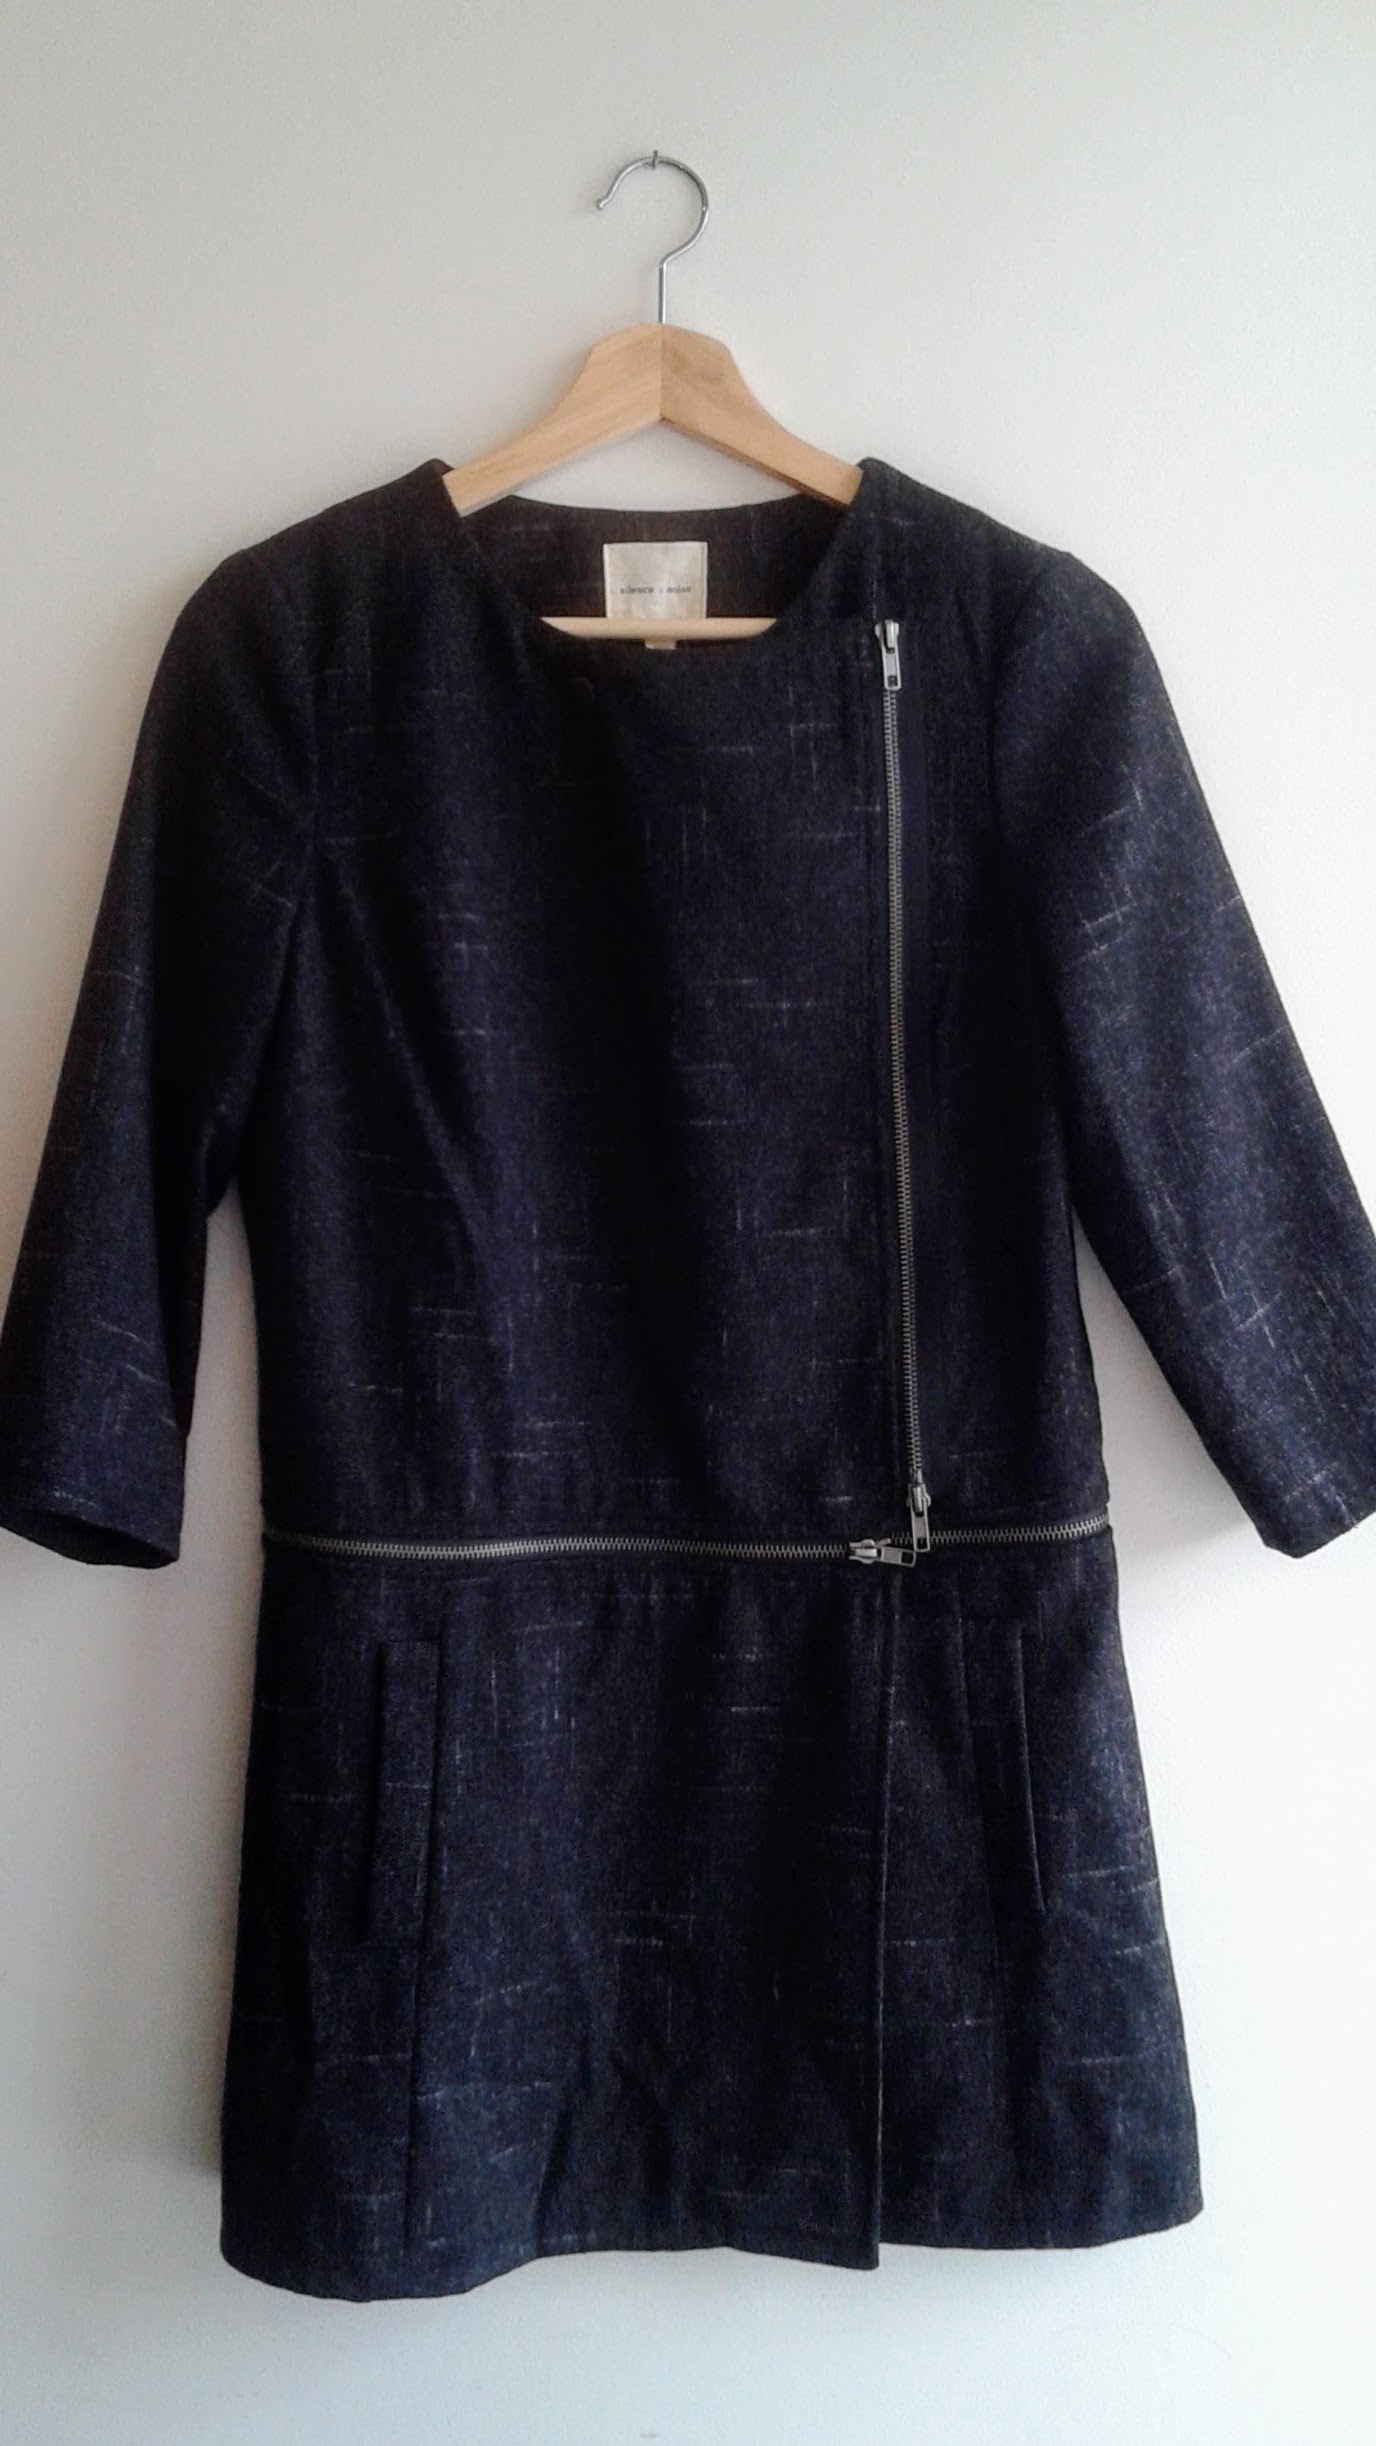 Silence + Noise dress; Size S, $34